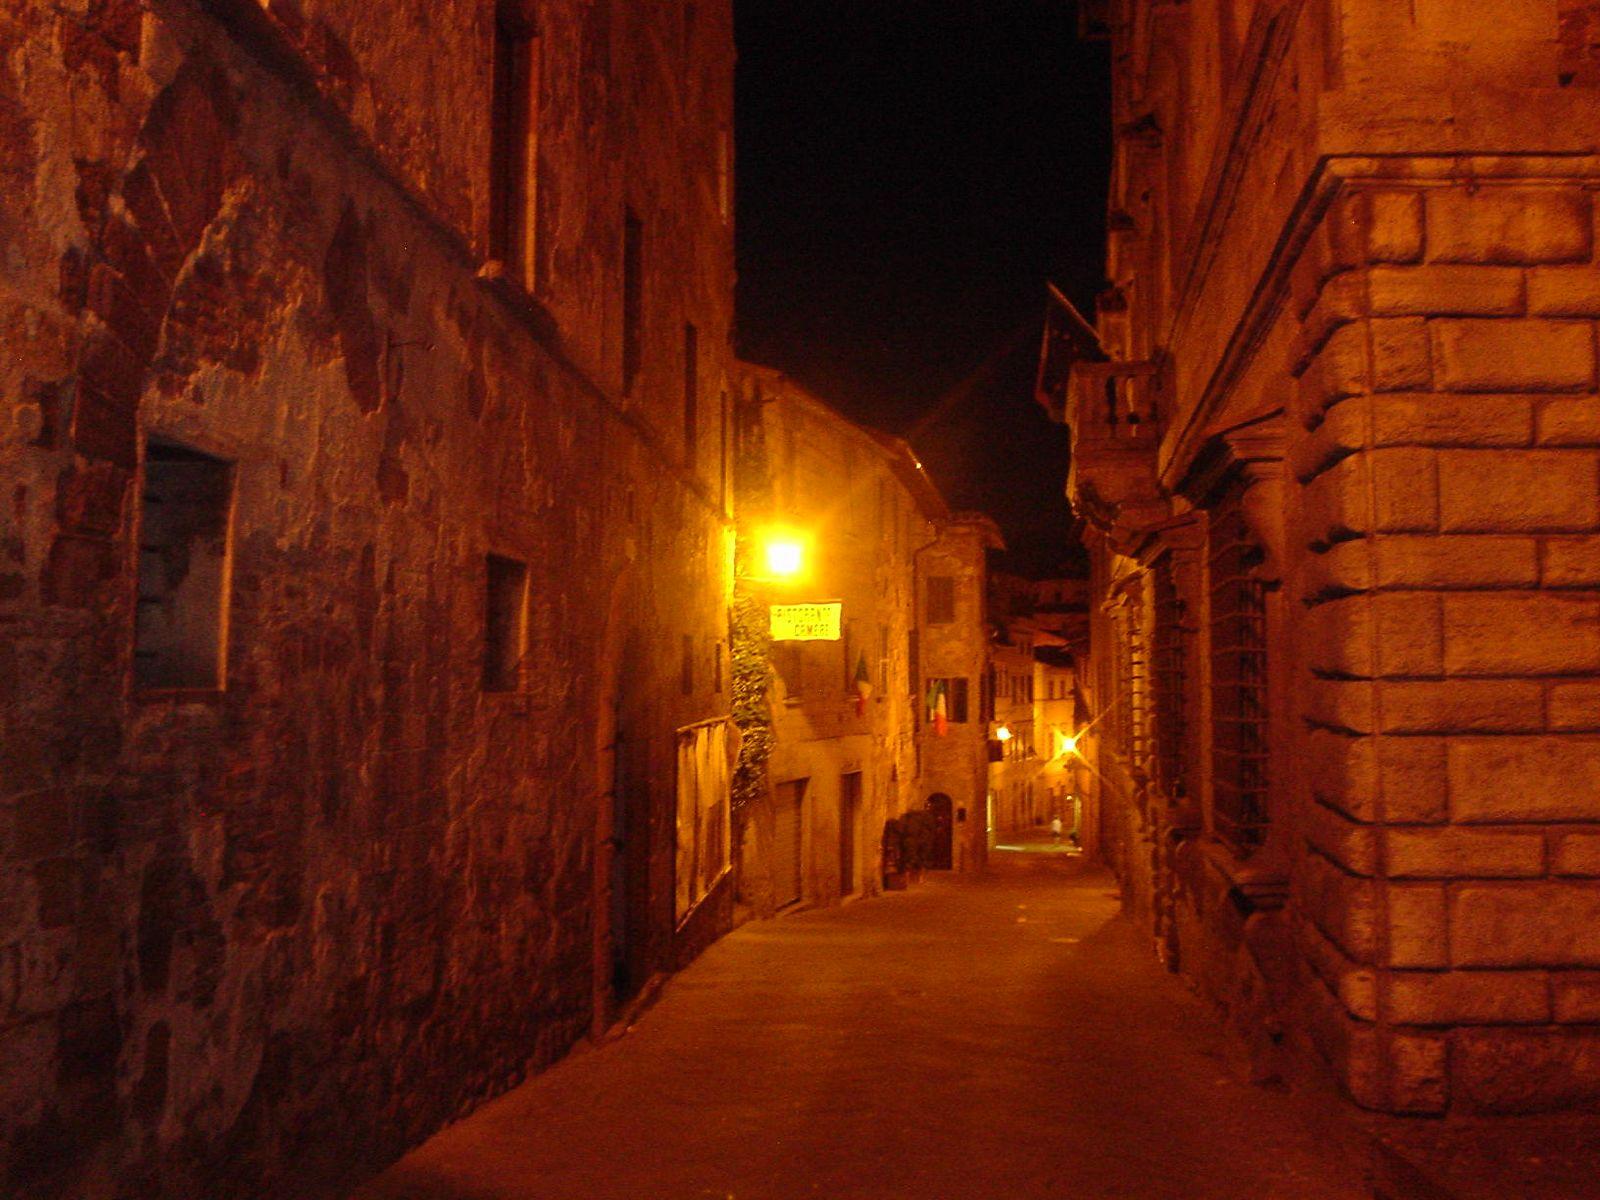 Montepulciano di notte